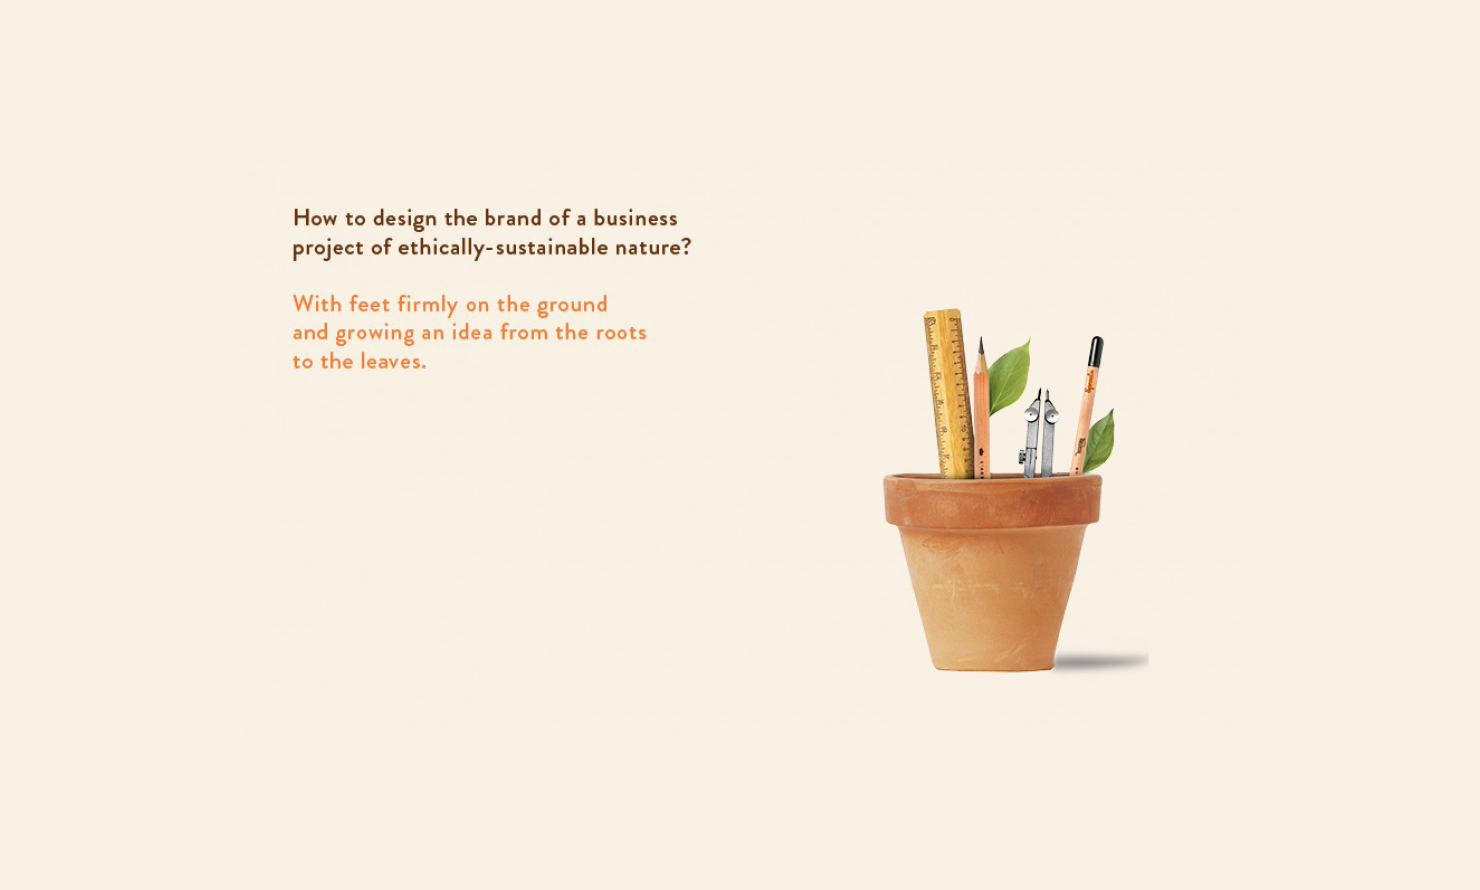 https://www.kubelibre.com/uploads/Slider-work-tutti-clienti/manital-vistaterra-l-agriparco-che-abbraccia-il-castello-brand-identity-brand-strategy-2.jpg